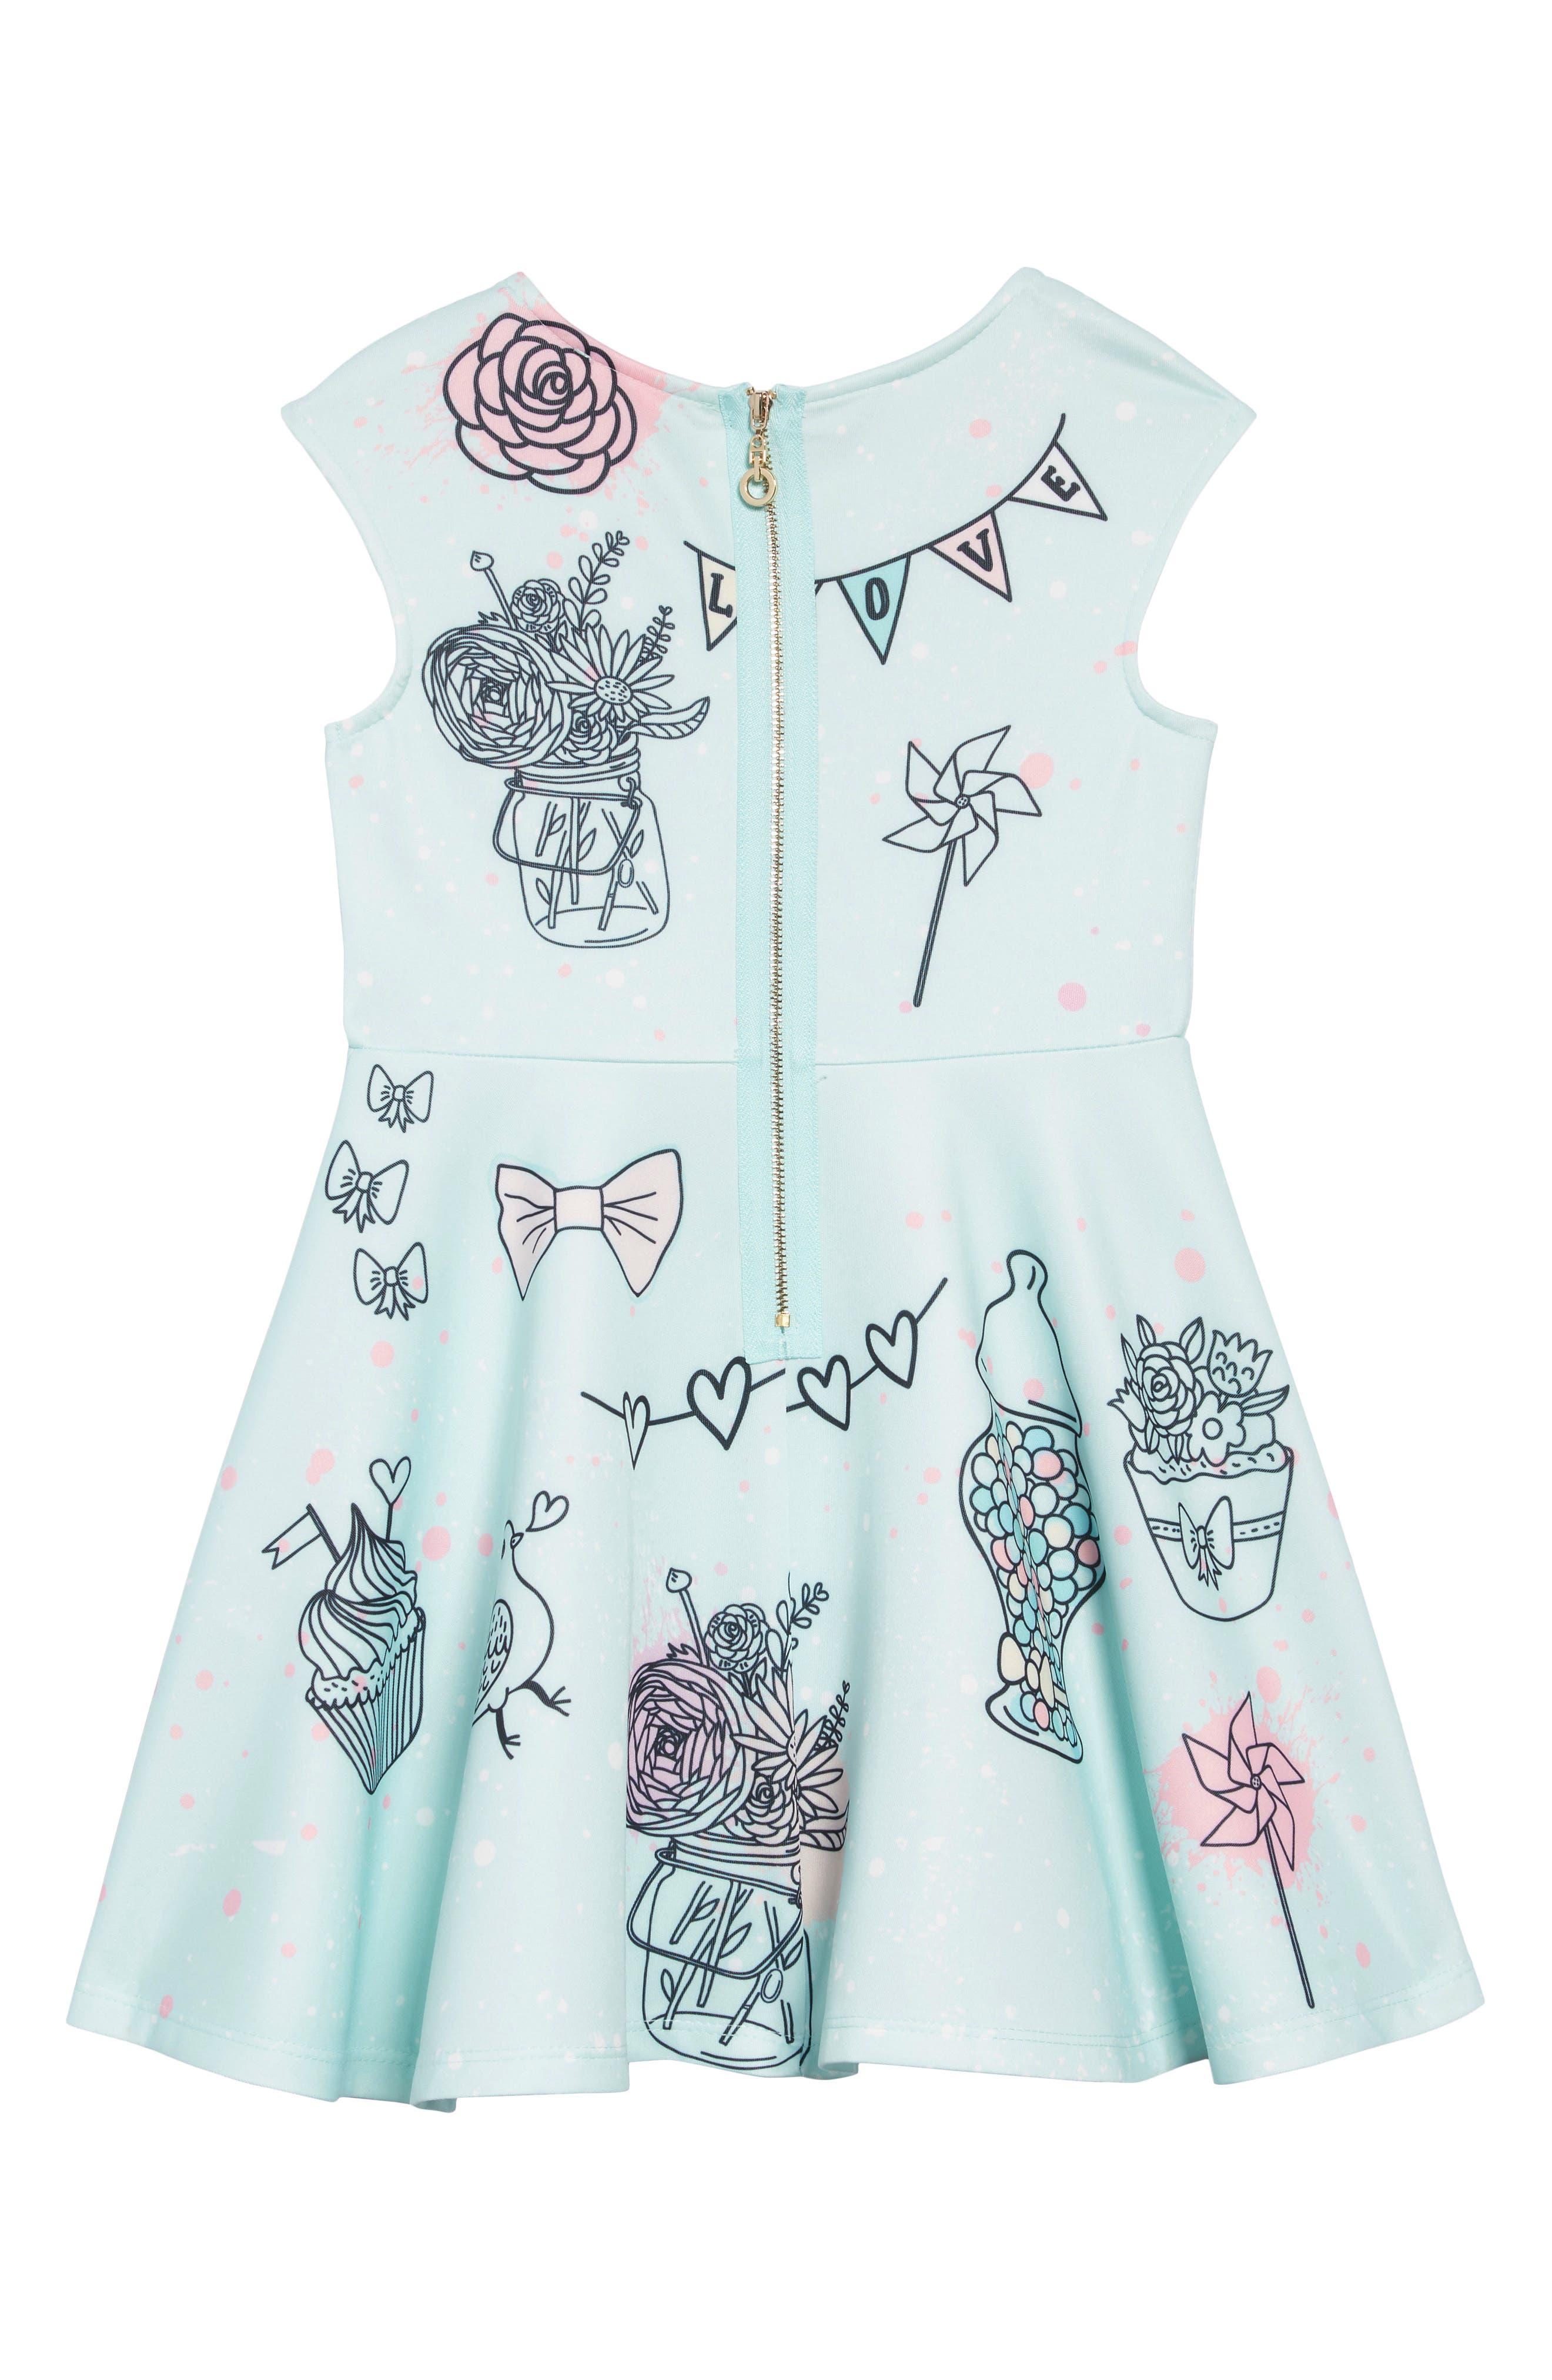 Whimsy Embellished Fit & Flare Dress,                             Alternate thumbnail 2, color,                             AQUA MULTI